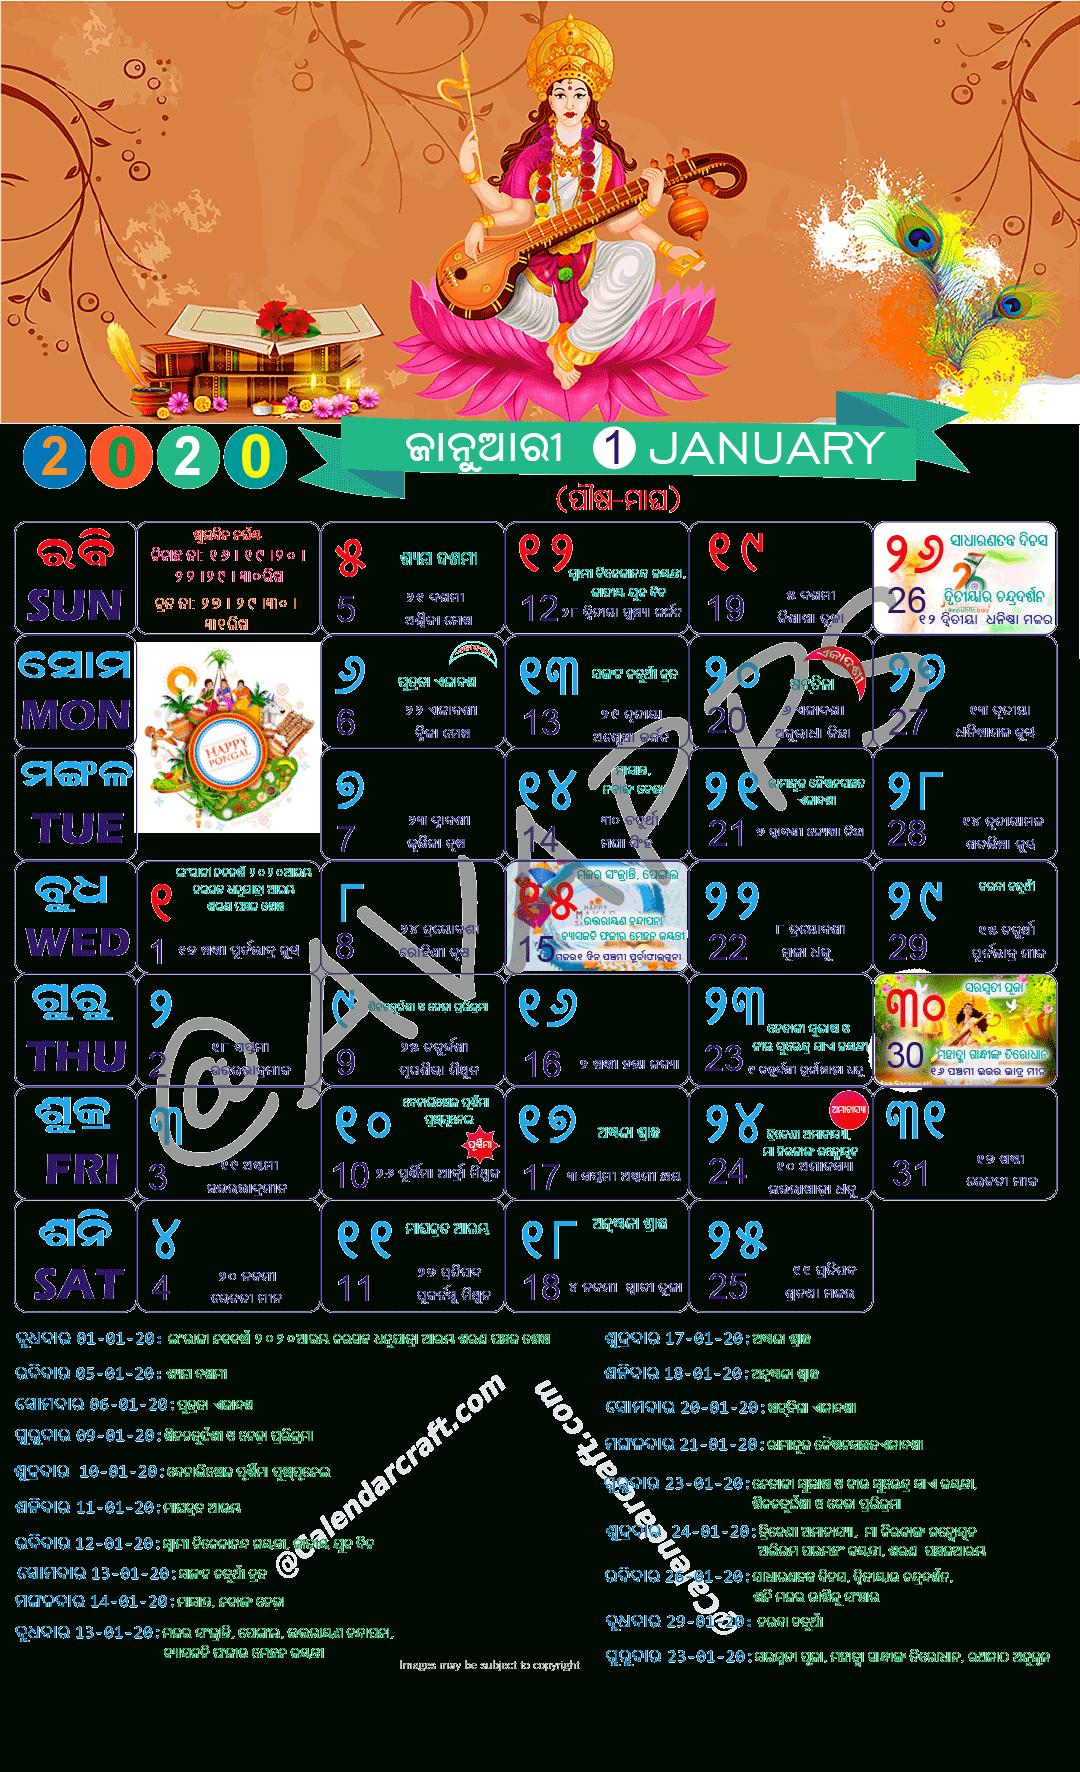 Odia Calendar 2020 Kohinoor Pdf | Seg throughout Bihar Sarkar Ka Calendar 2020